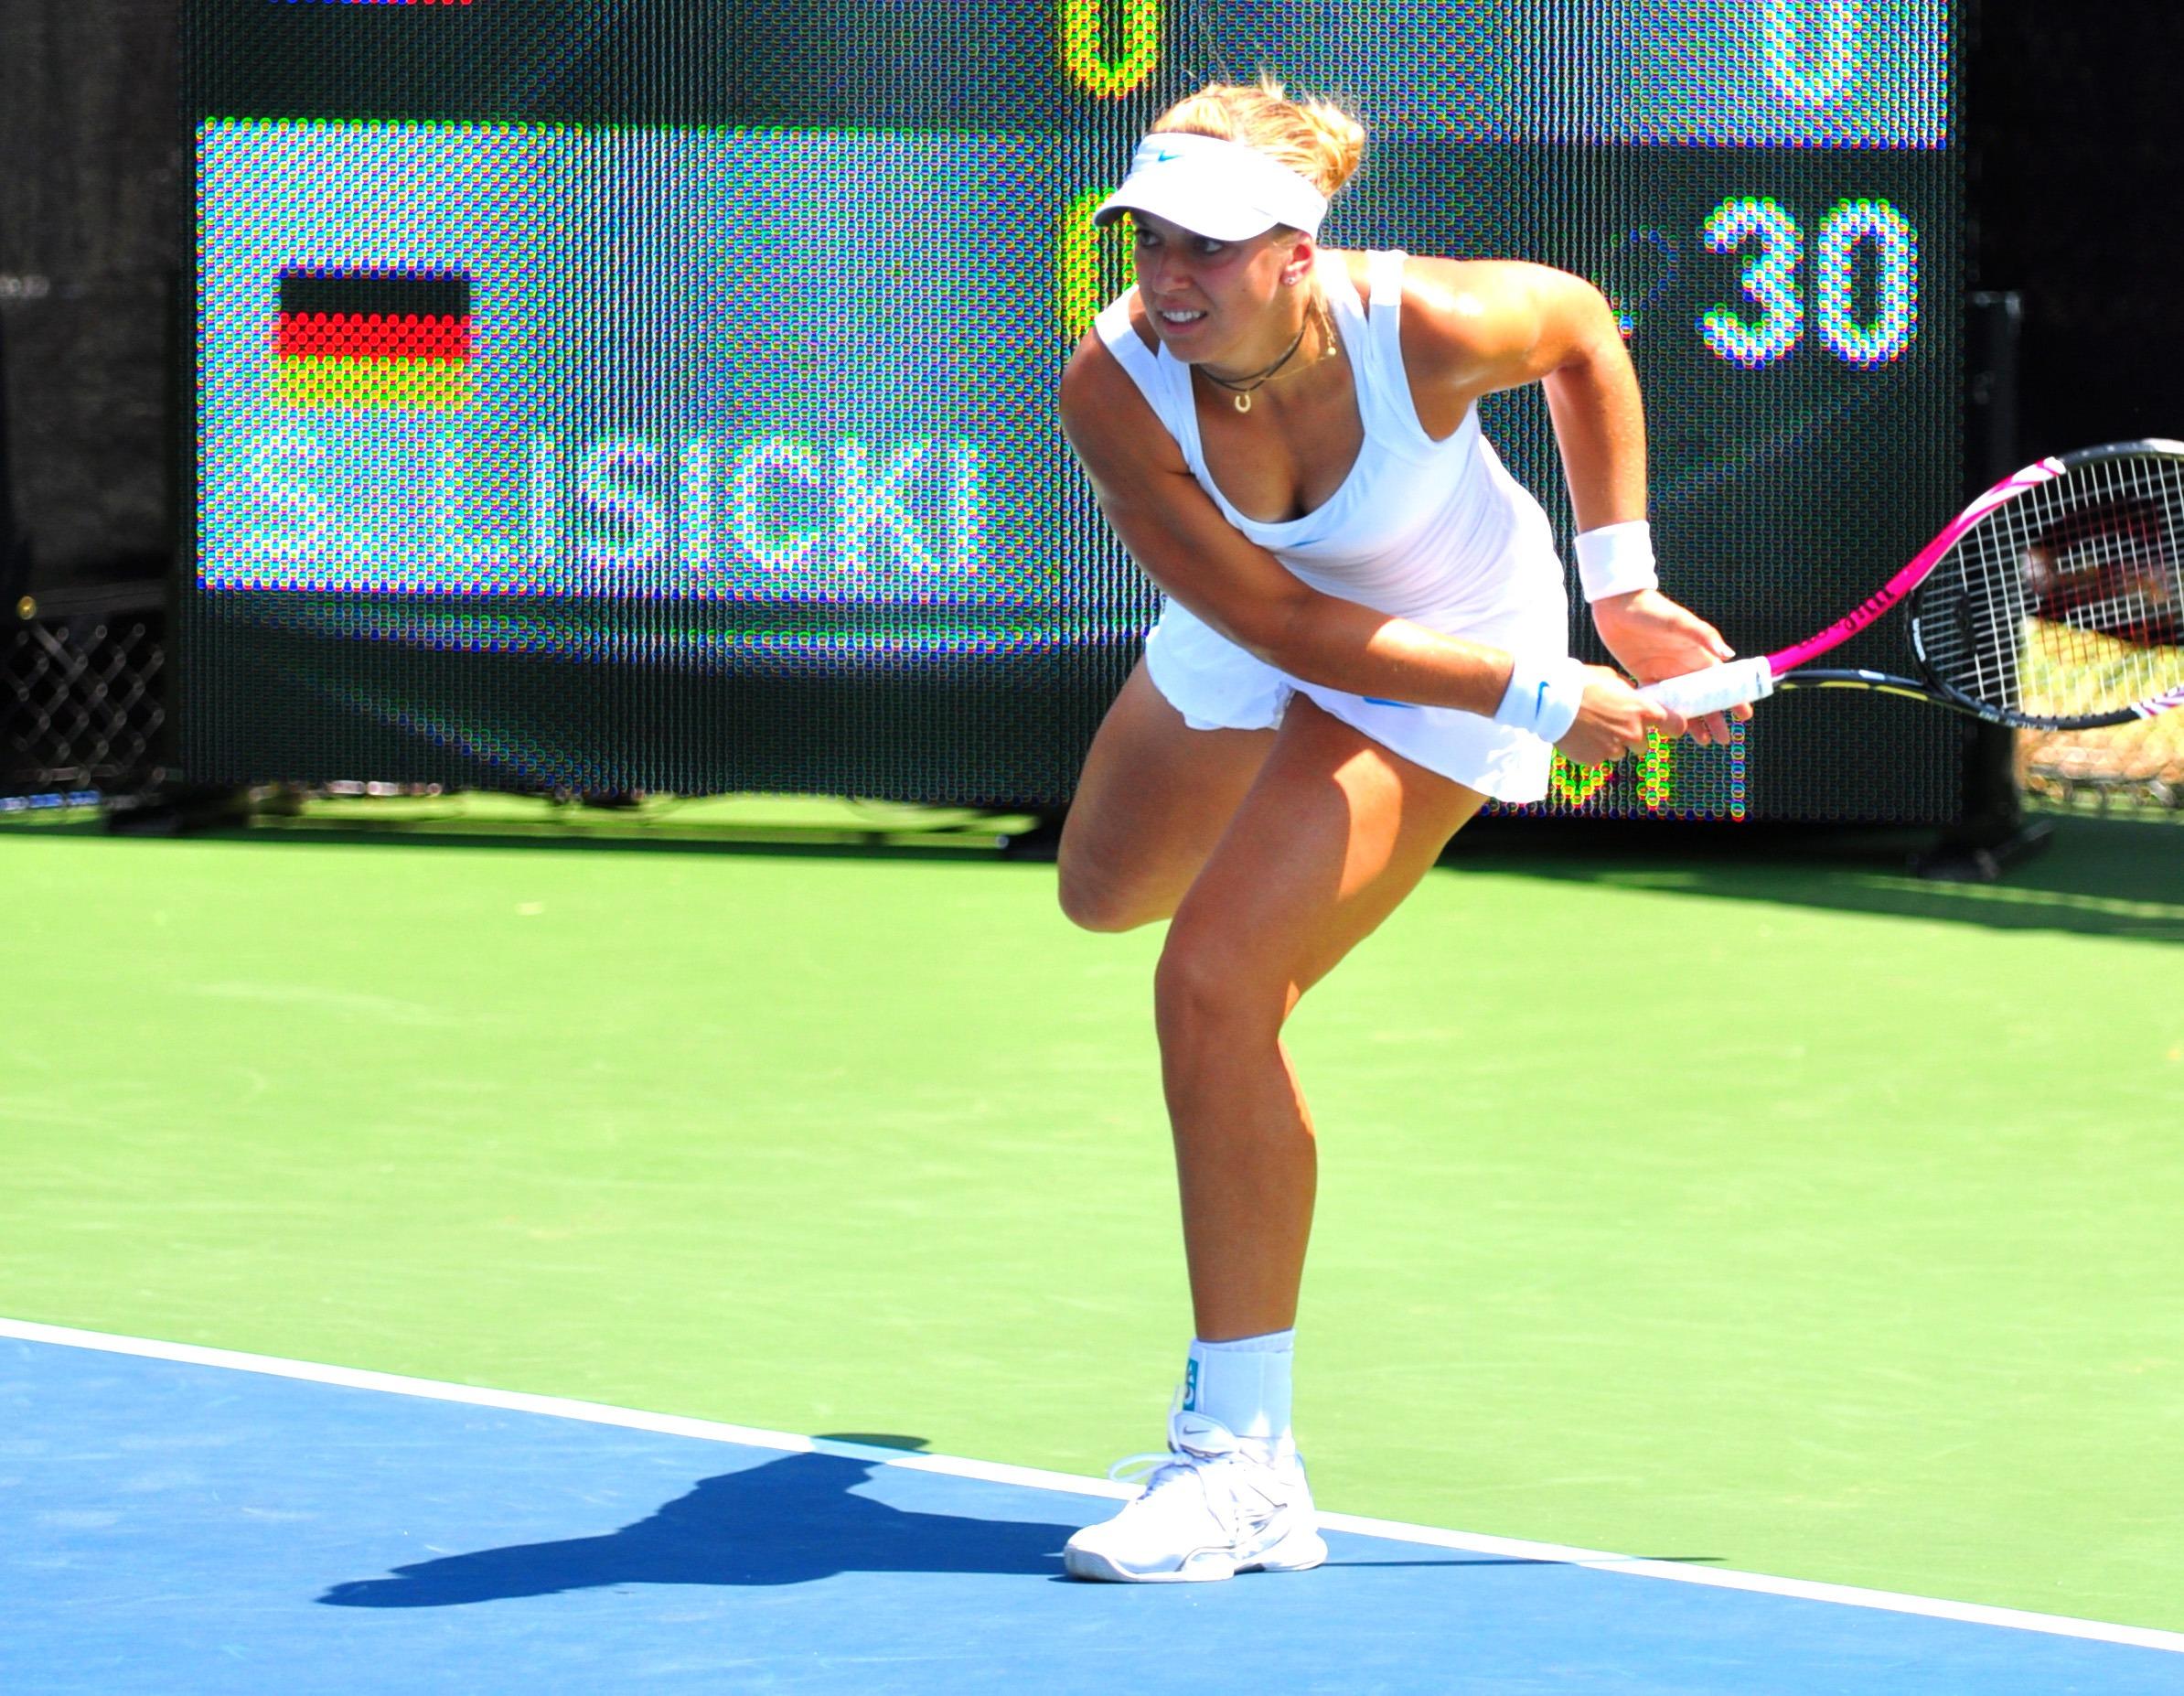 Deși nu e deloc înaltă (1,78 m), Sabine Lisicki servește ca din tun (wikimedia.org)